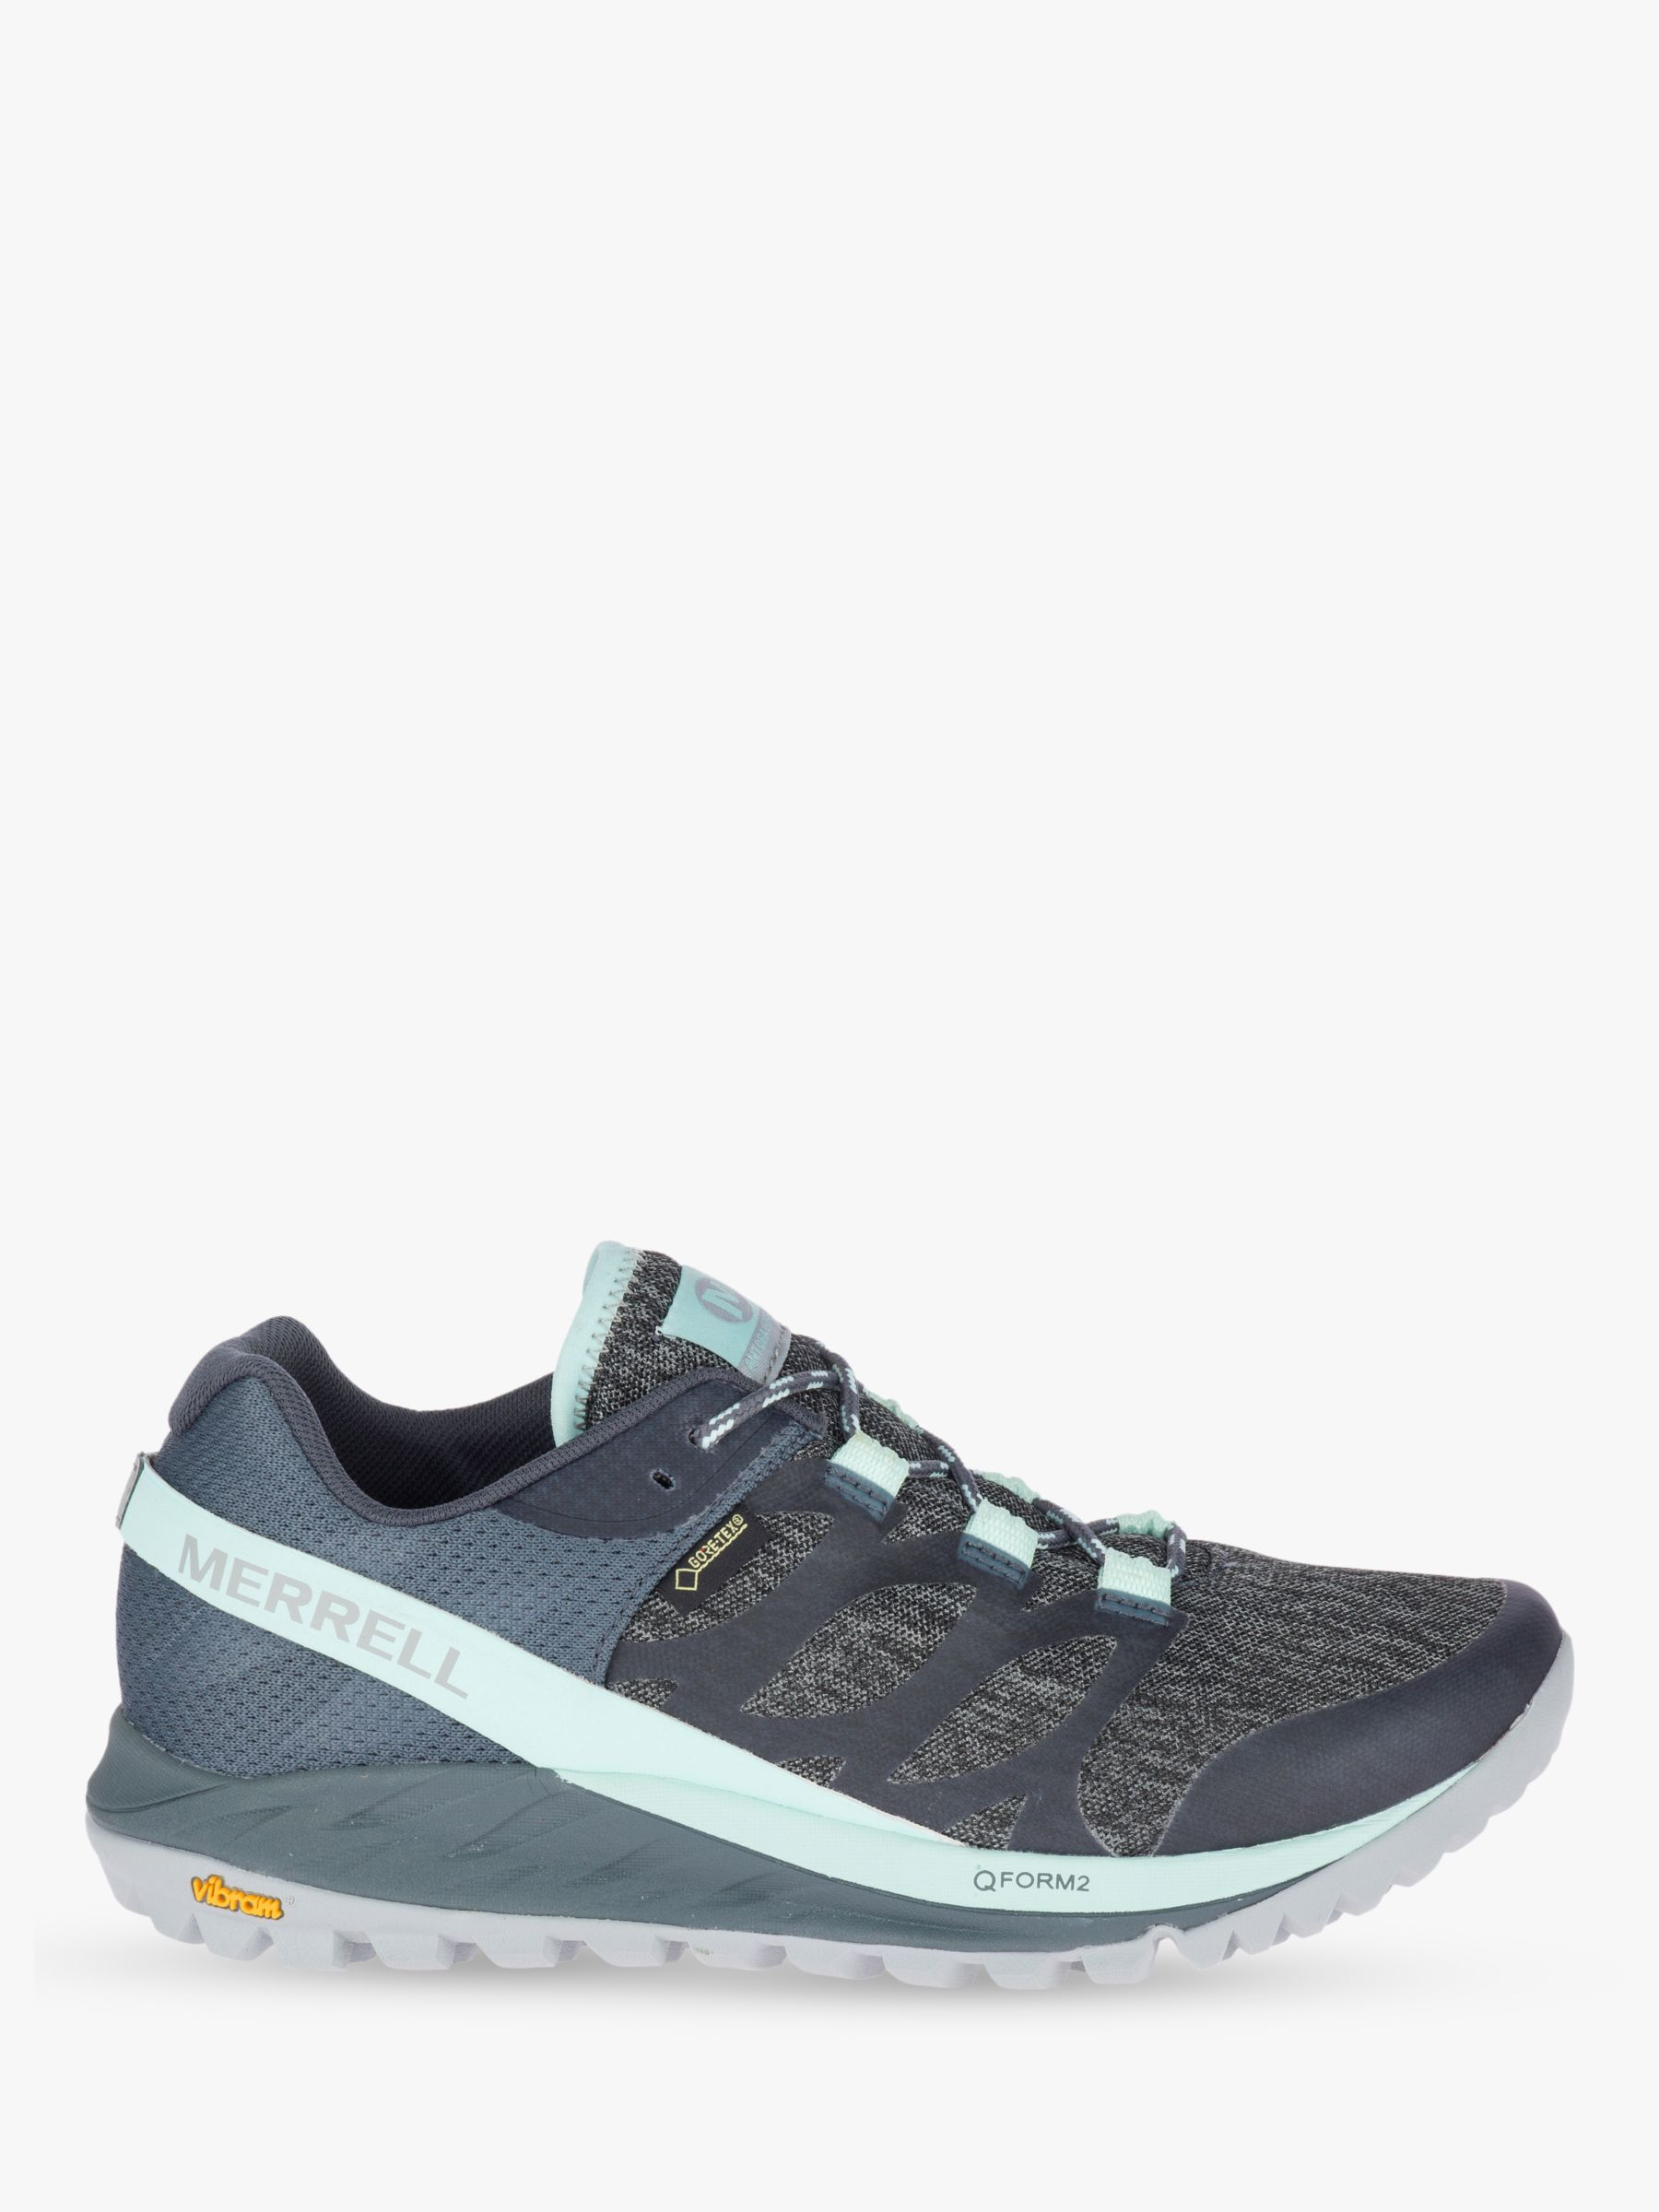 Merrell Merrell Antora Women's Waterproof Gore-Tex Trail Running Shoes, Turbulence